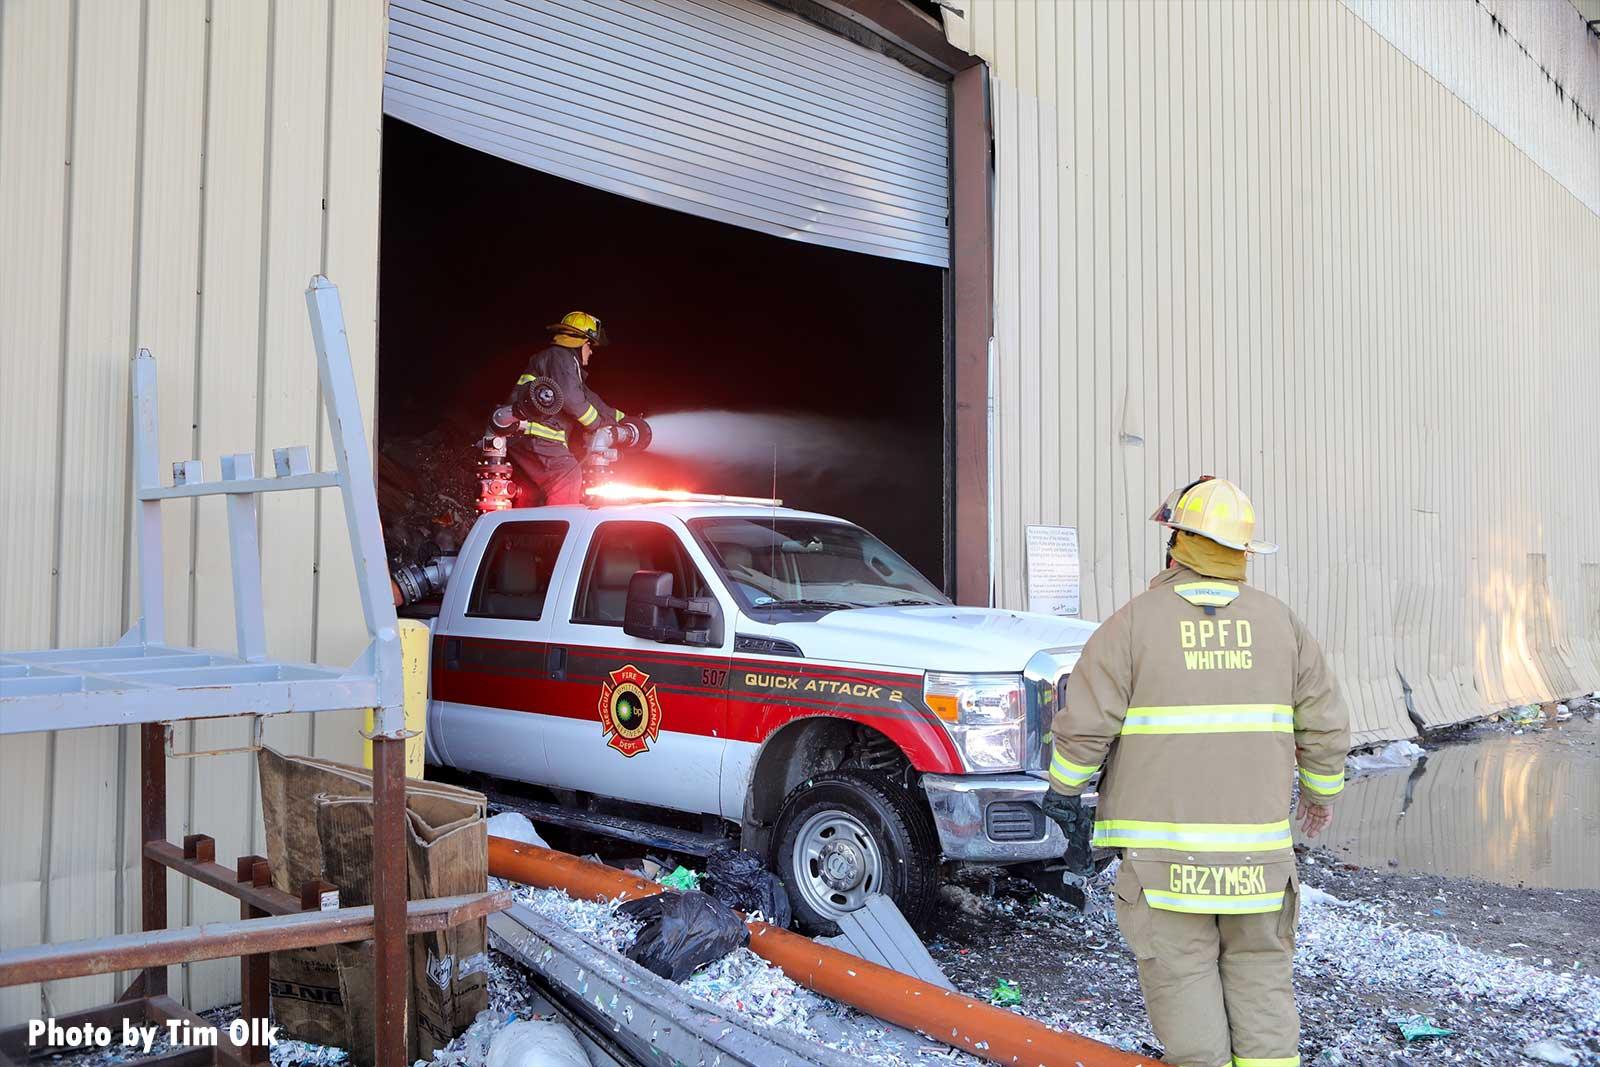 Firefighter on truck backed inside building